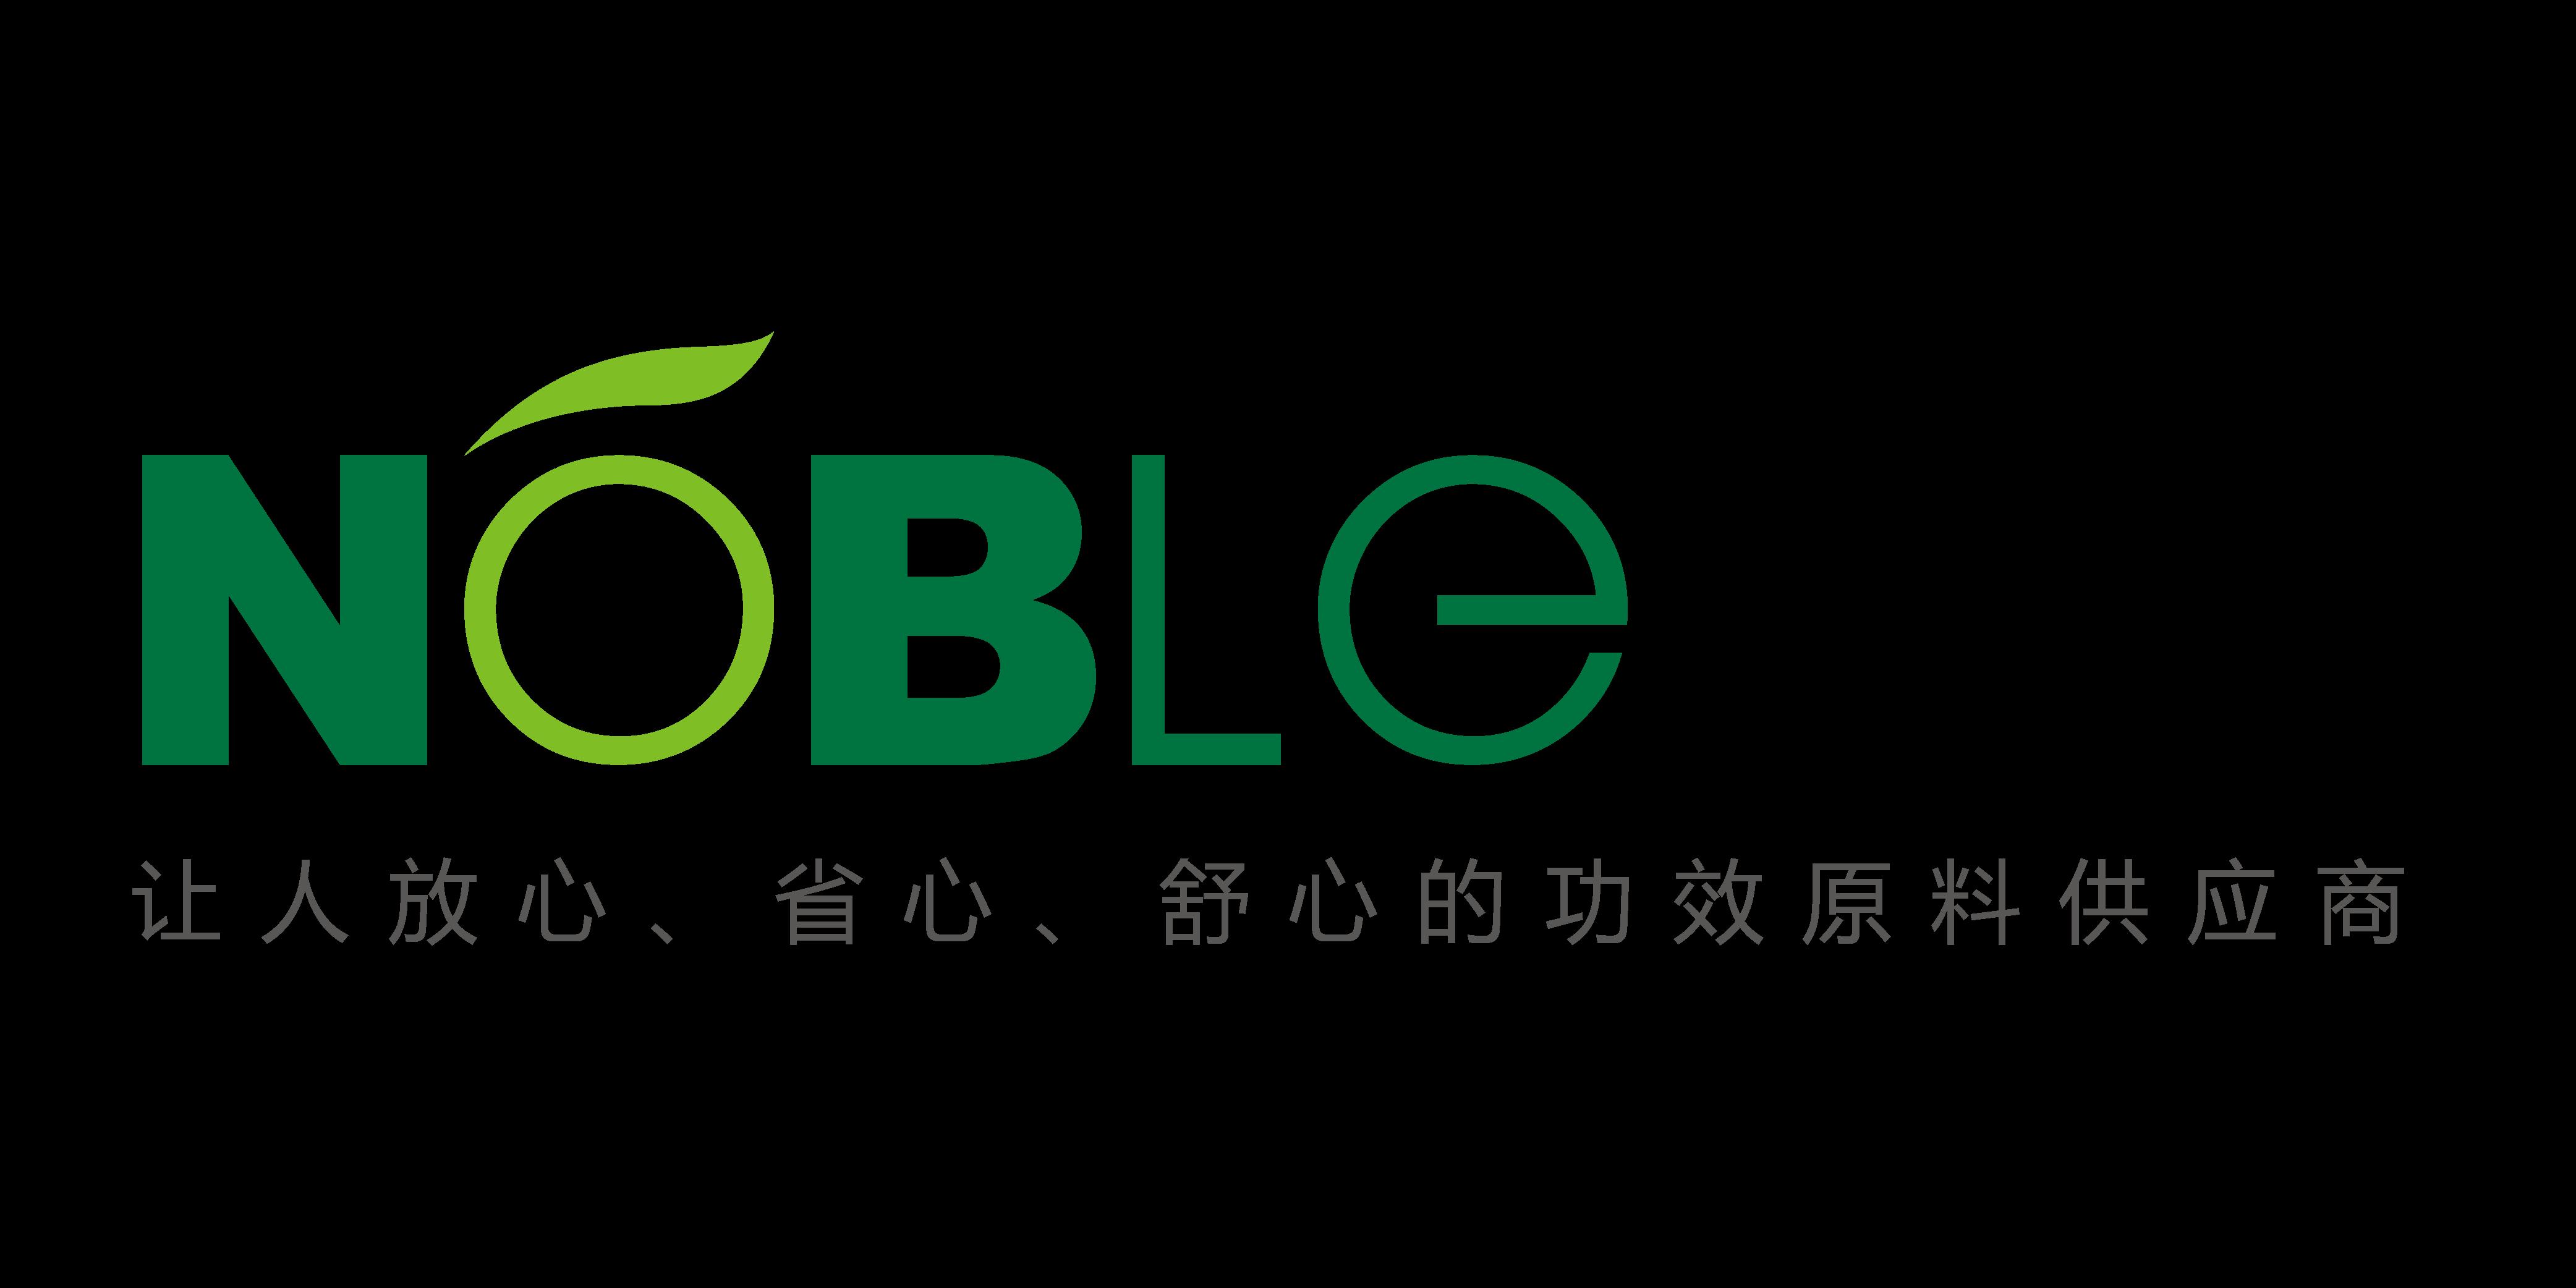 http://manual.pchi-china.com/highset/file/view/201852970185265154